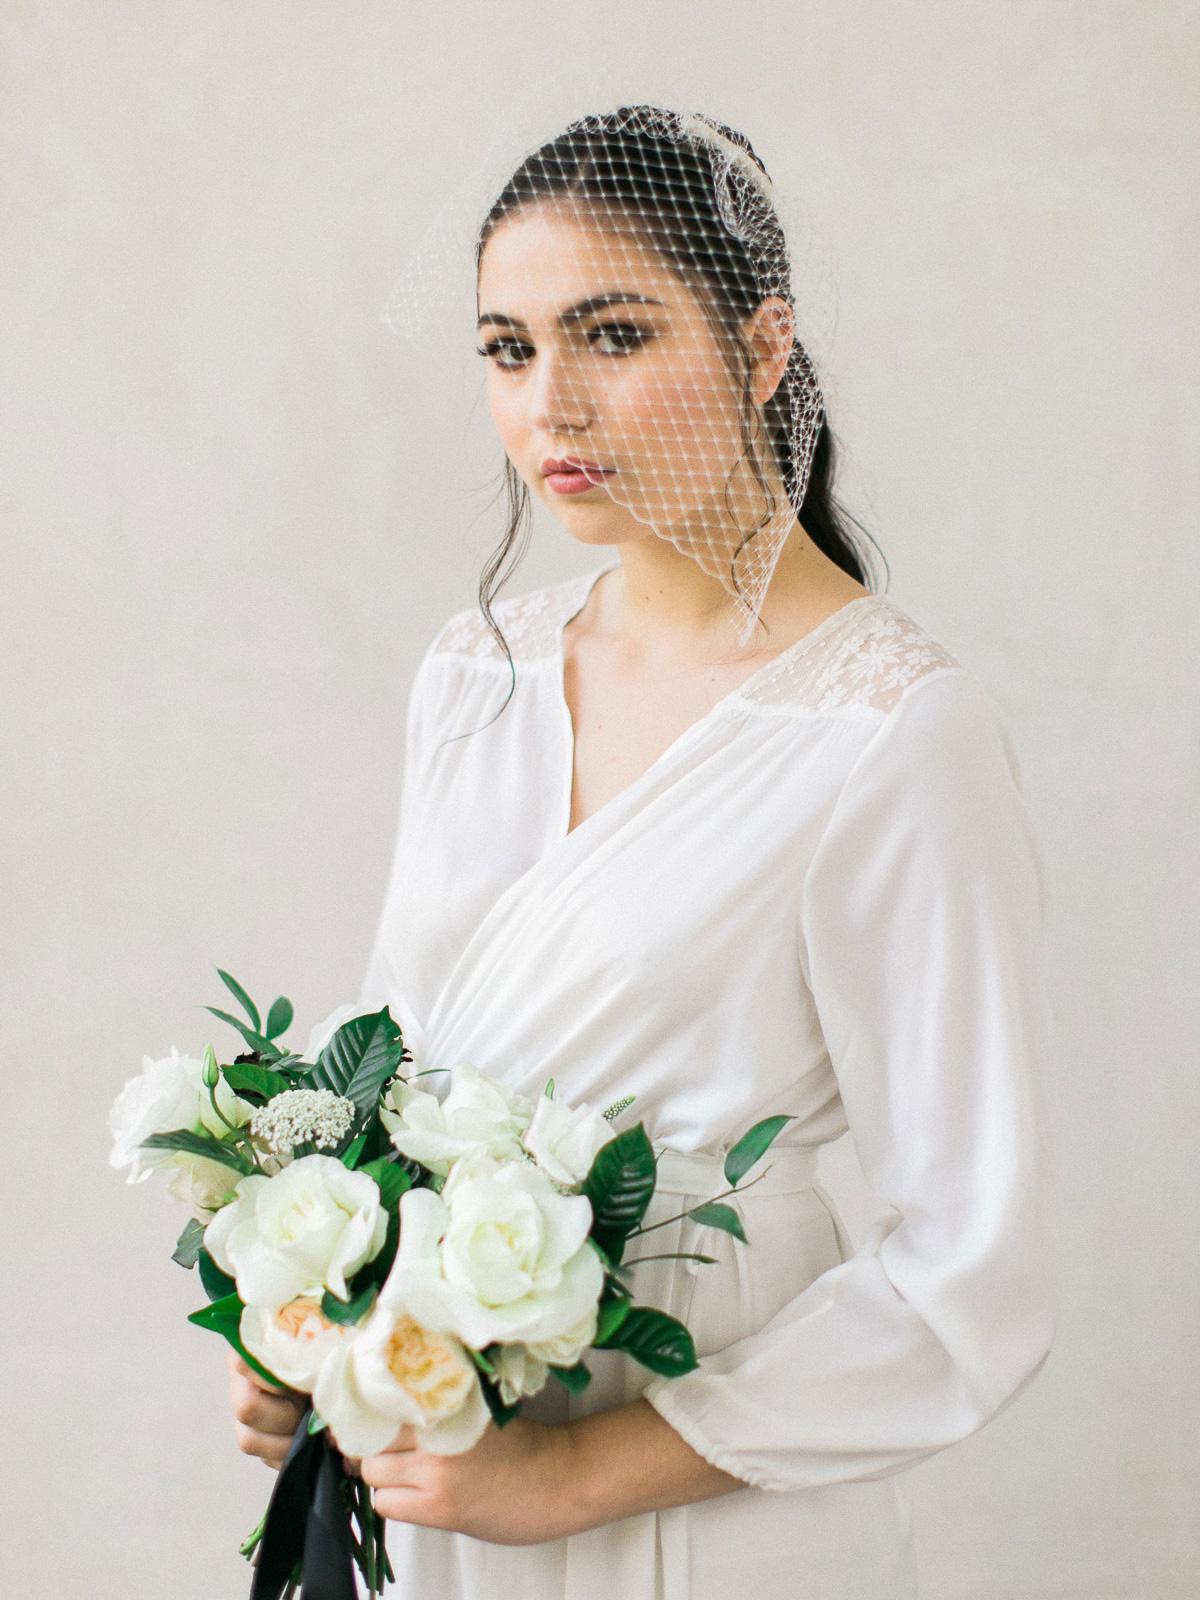 kurtz-orpia-photography-vineyard-bride-swish-list-dundurn-castle-dundas-wedding-editorial-16.jpg